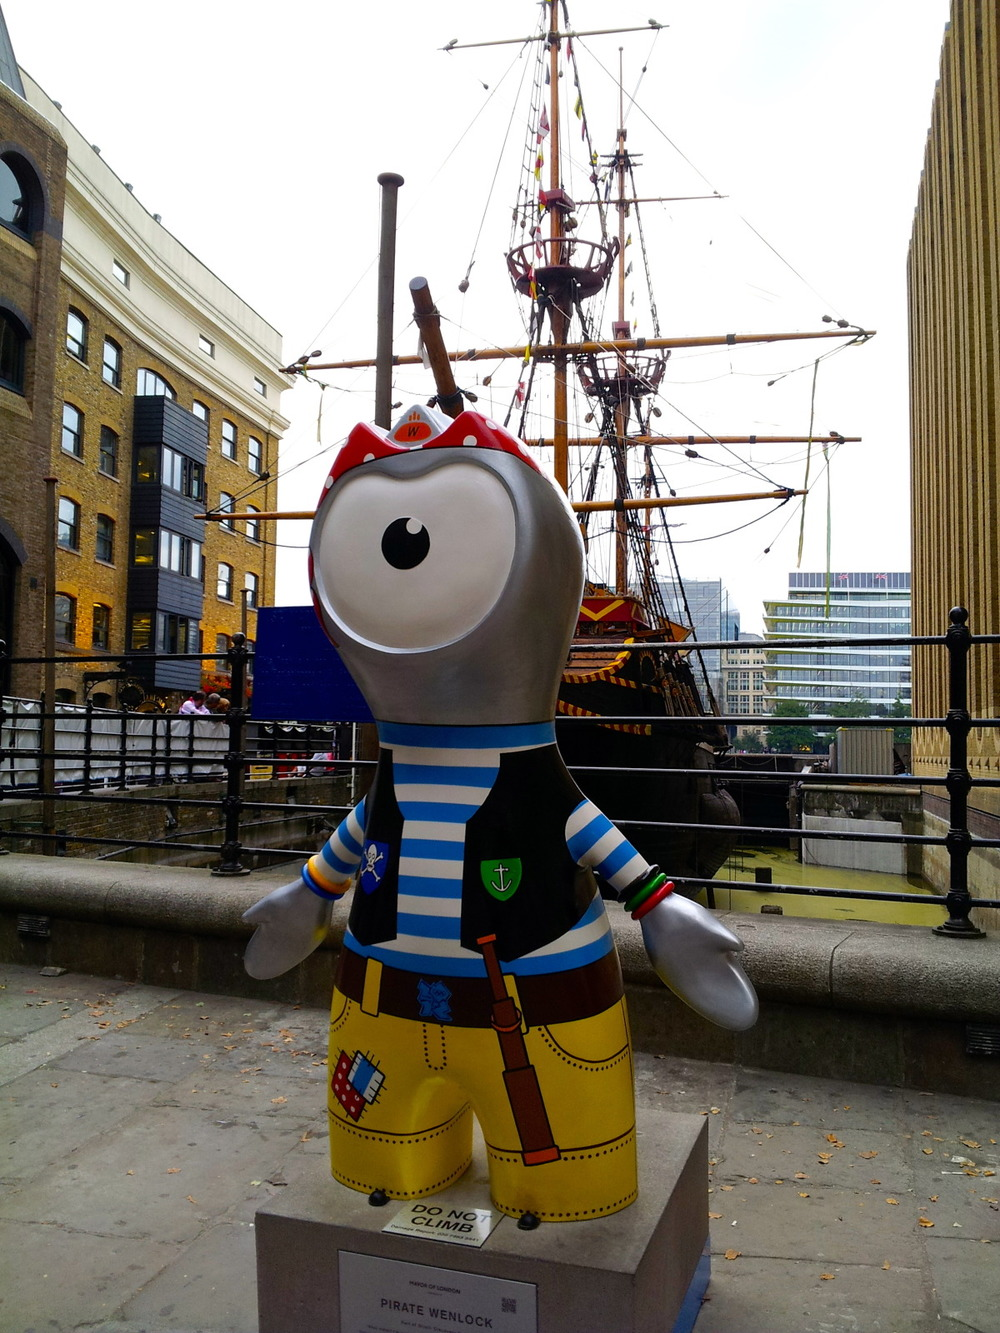 Pirate Wenlock